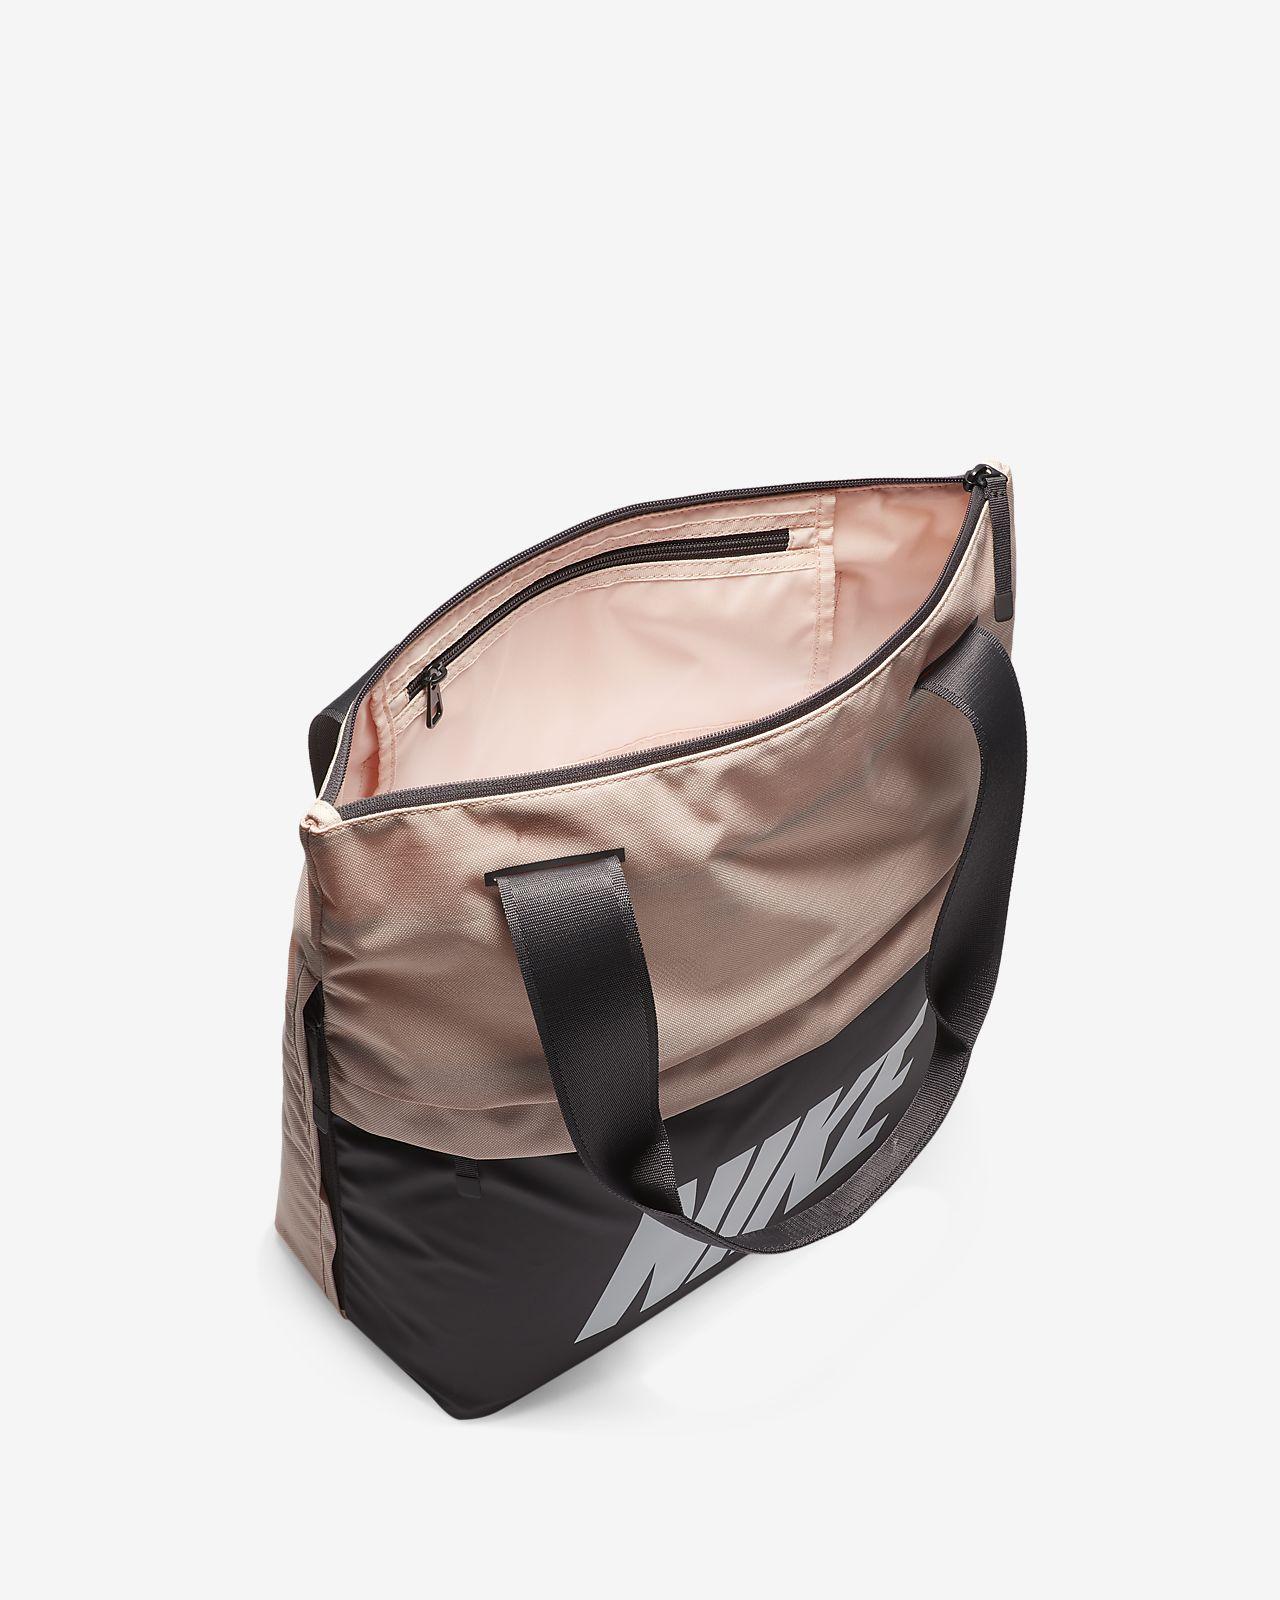 9f2664b3f5 Γυναικεία τσάντα ώμου για προπόνηση με σχέδια Nike Radiate. Nike.com GR